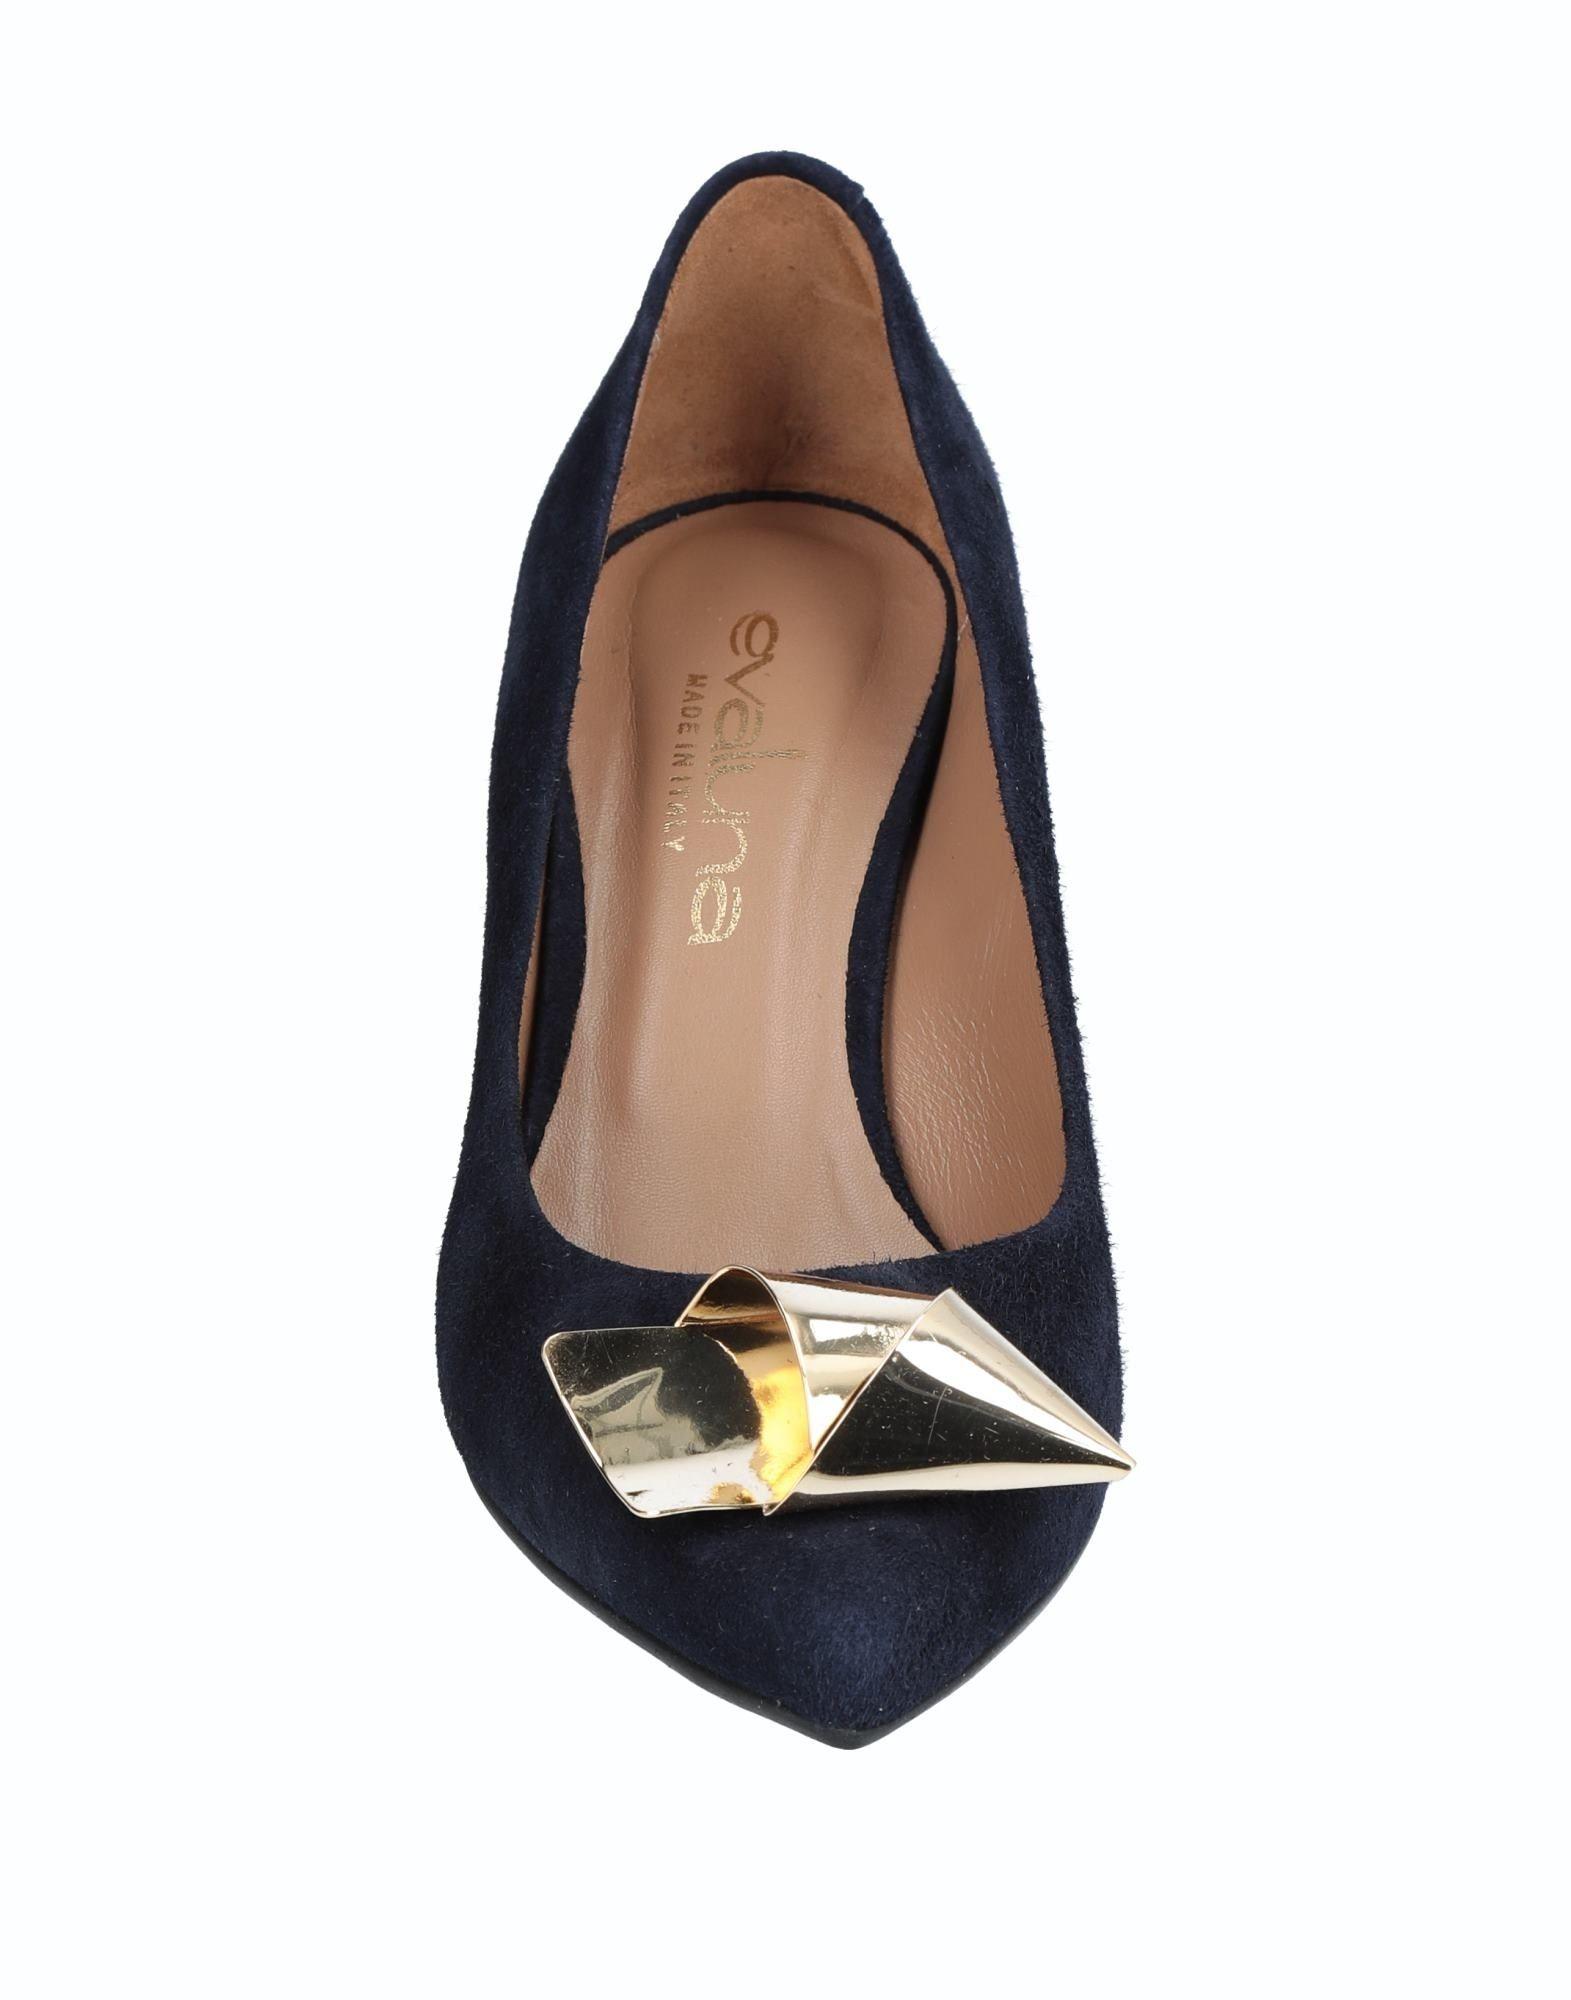 Evaluna Pumps Qualität Damen  11538147JG Gute Qualität Pumps beliebte Schuhe 04f29a